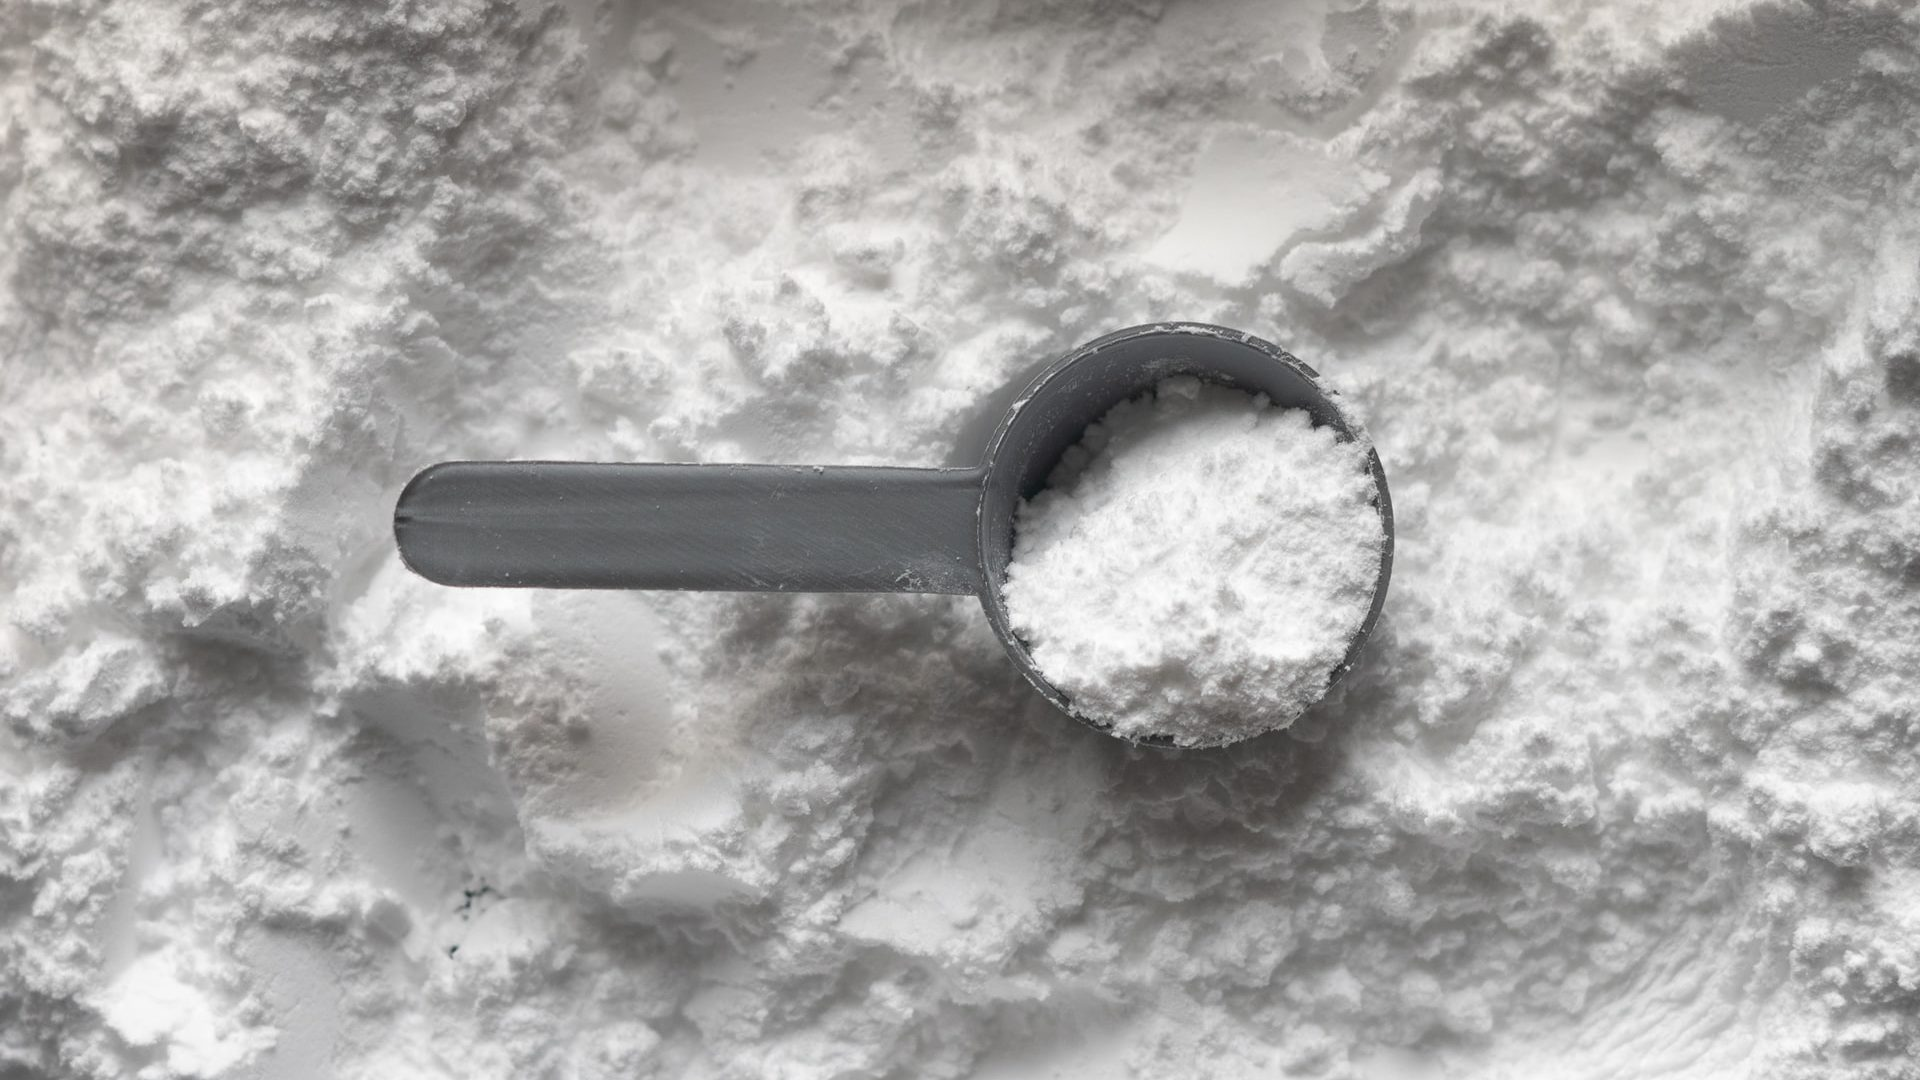 Schepje baking soda, bovenaanzicht